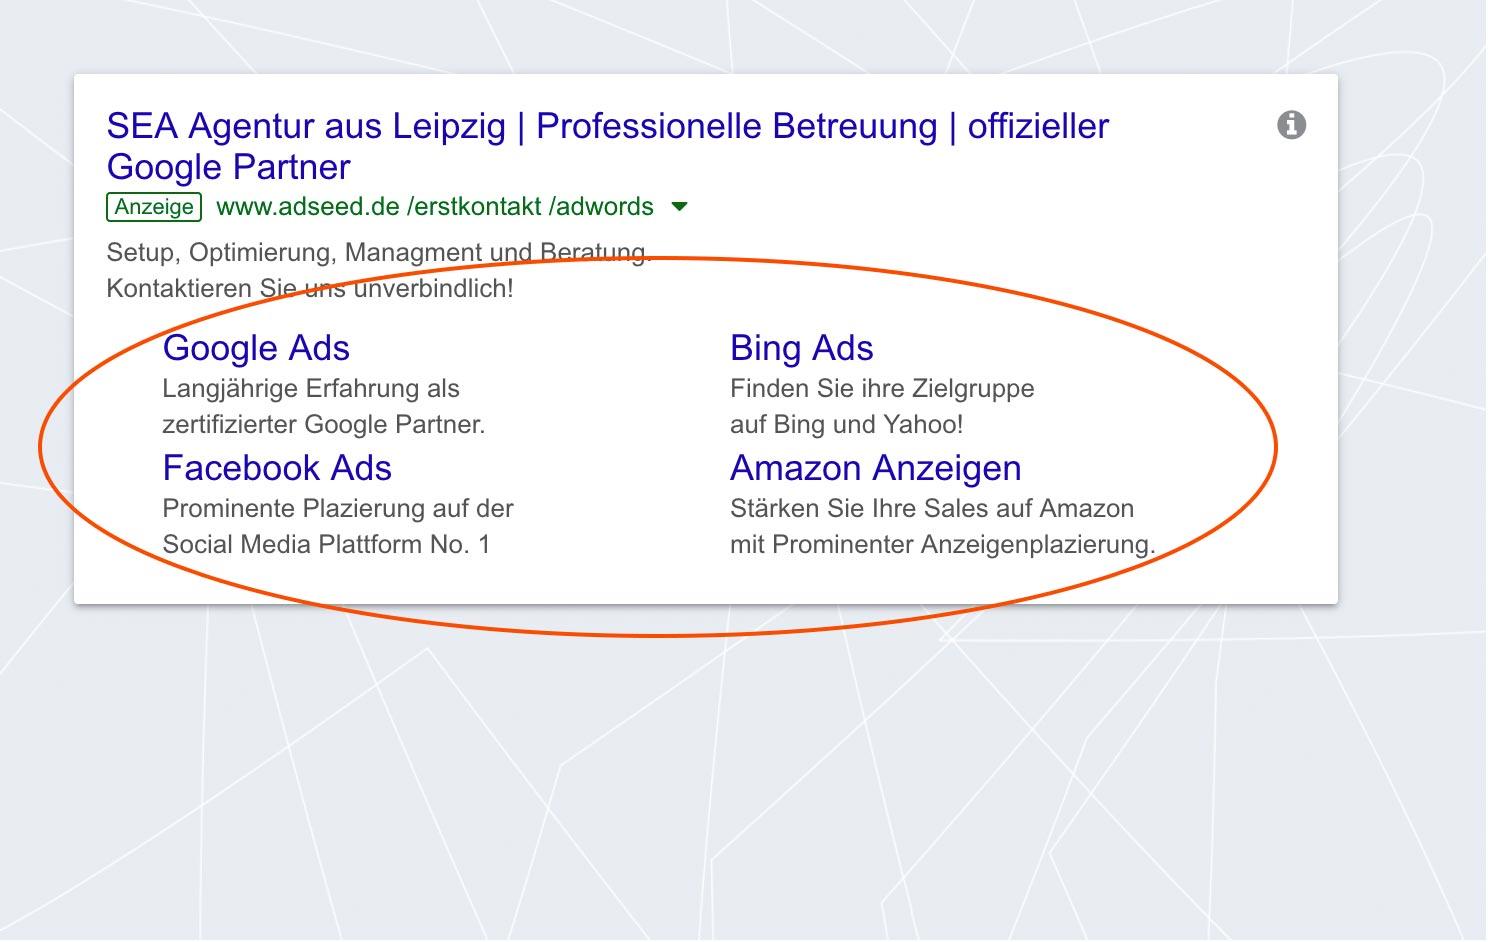 adseed - Google Ads Anzeige Sitelinks Desktop